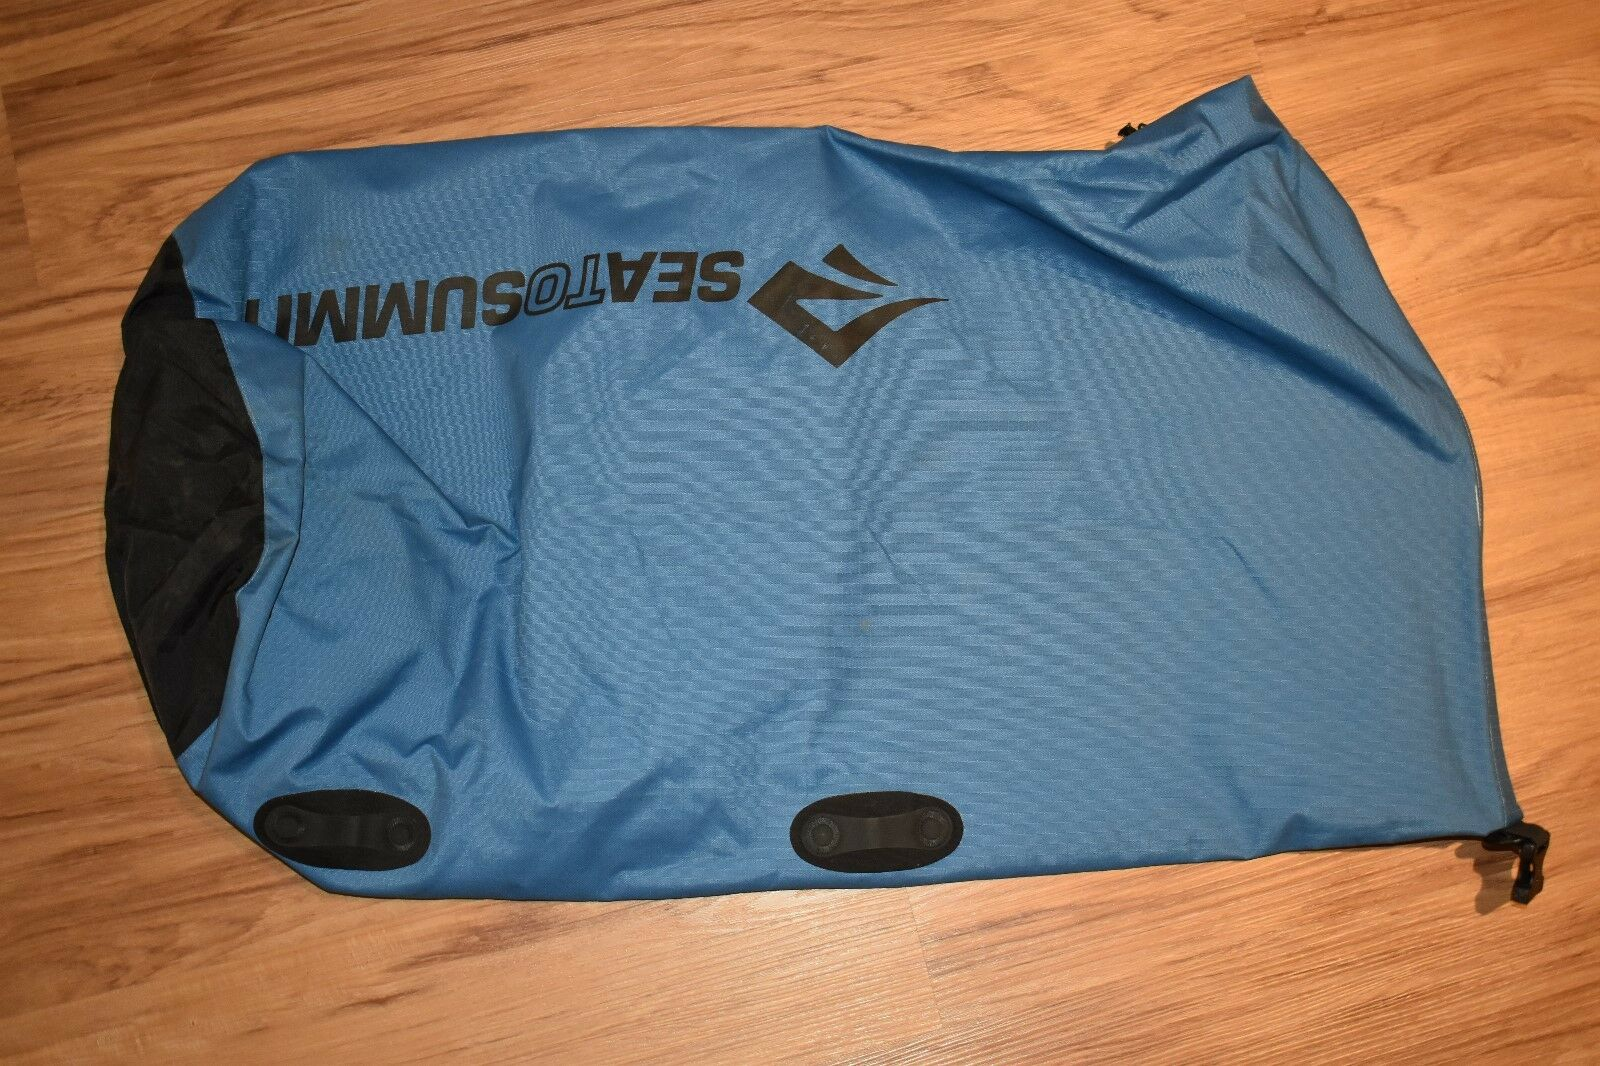 (L4B) SEATOSUMMIT DRY BAG WATERPROOF blueE